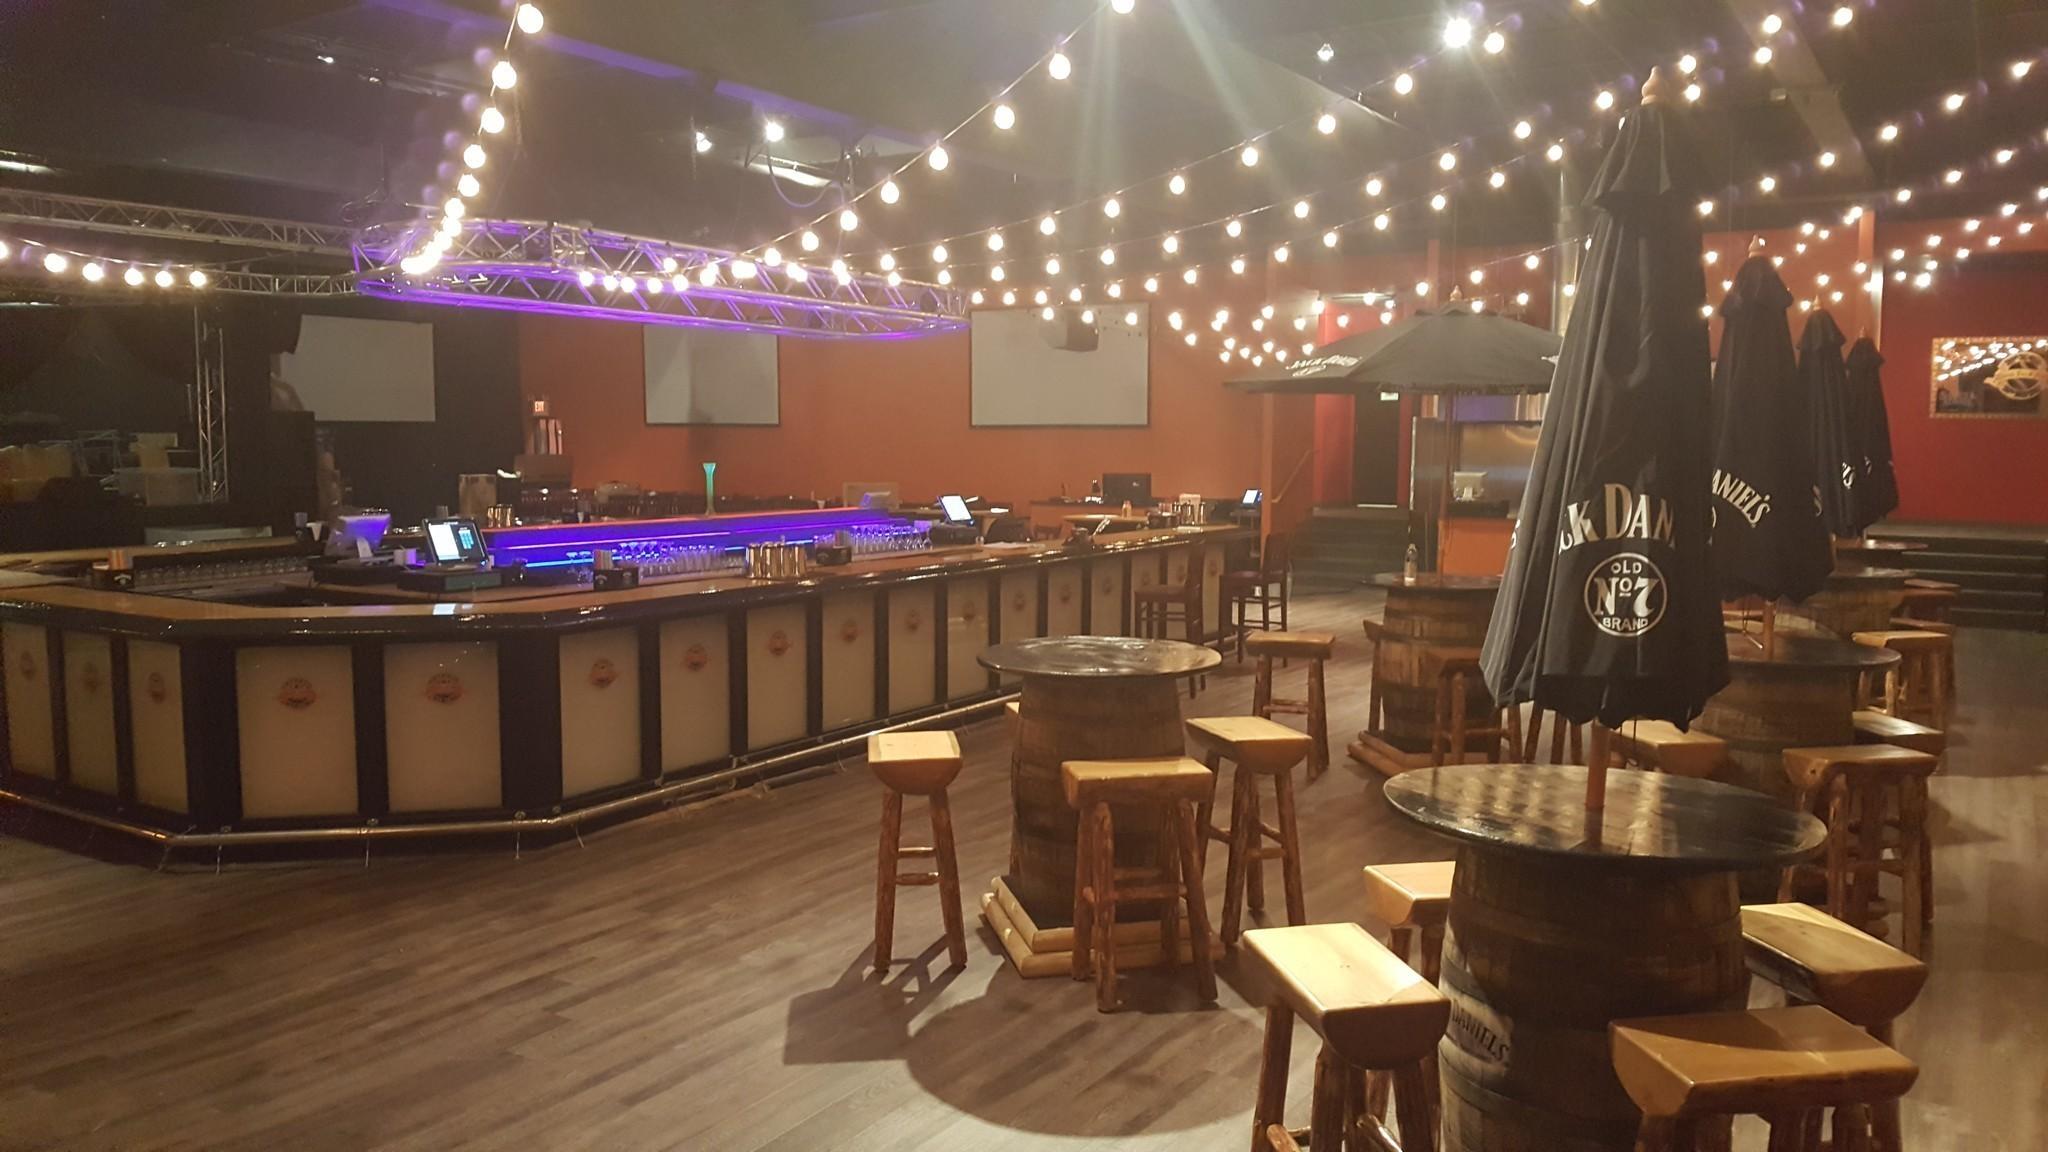 Allentown Pig Pen Fun Bar Opening This Weekend The